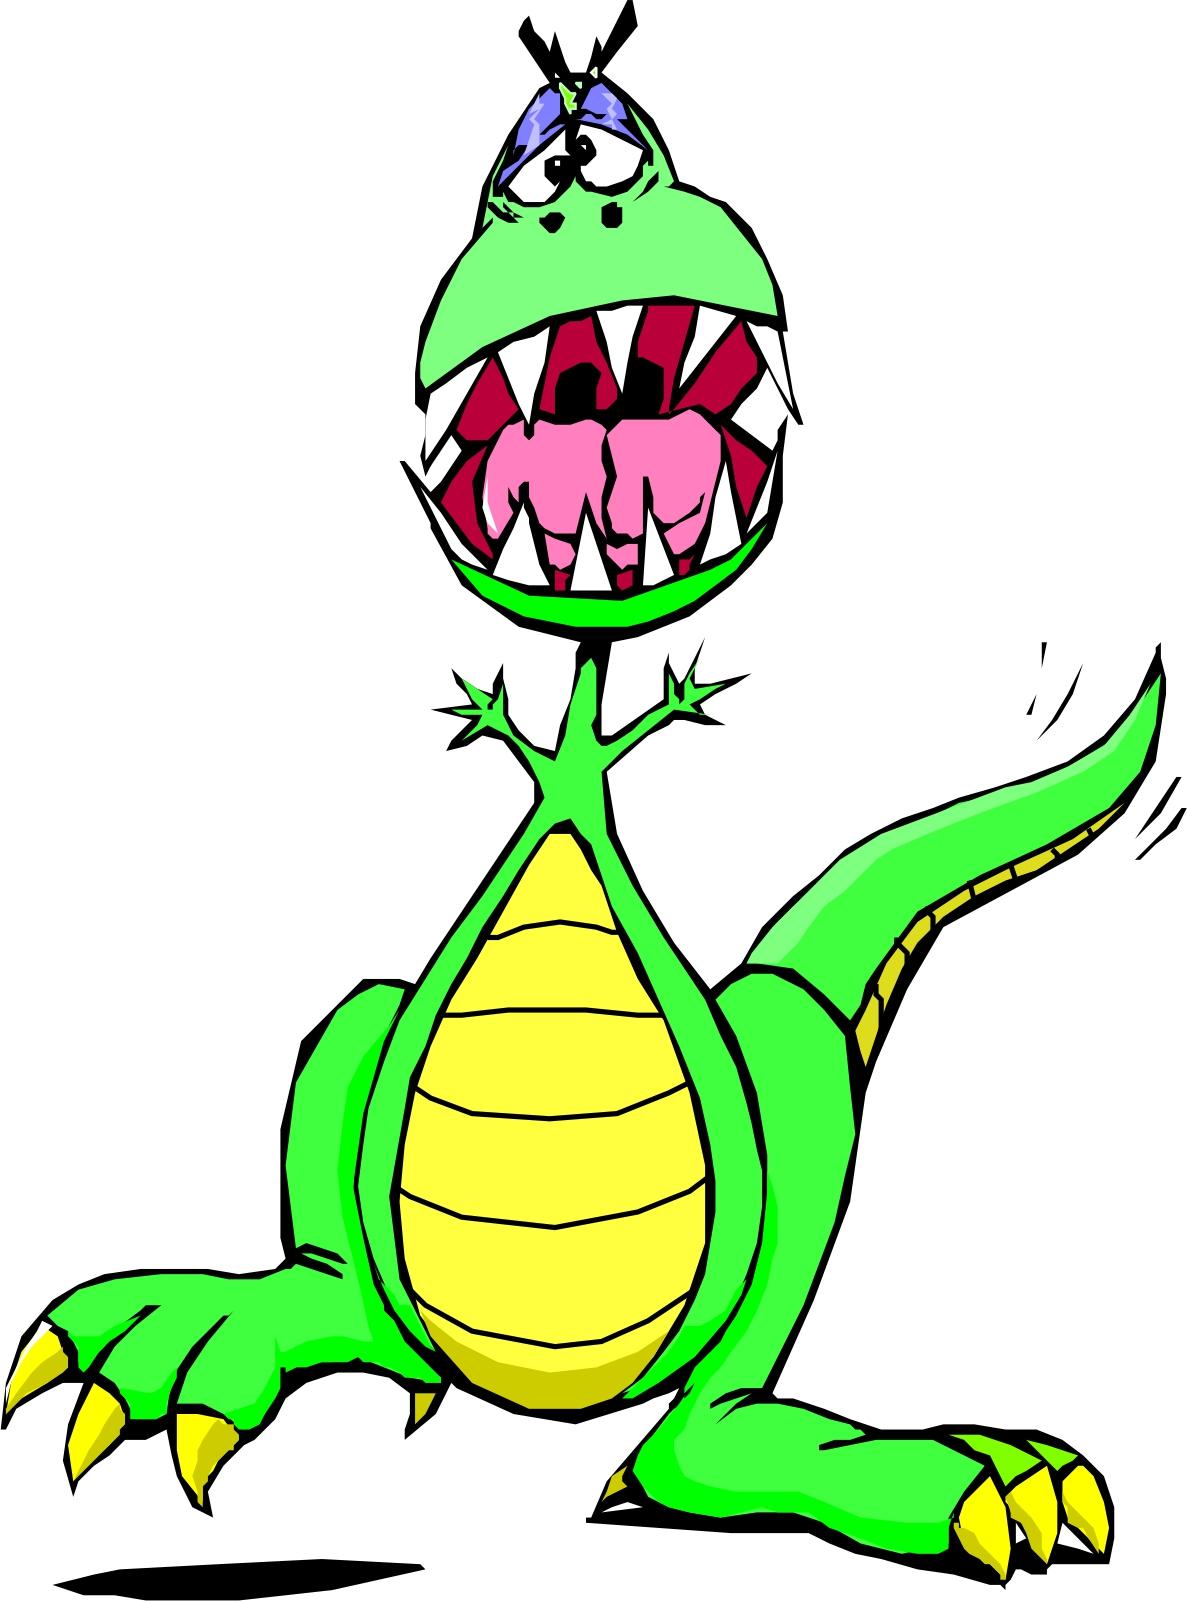 Wacky Dragon Mascot